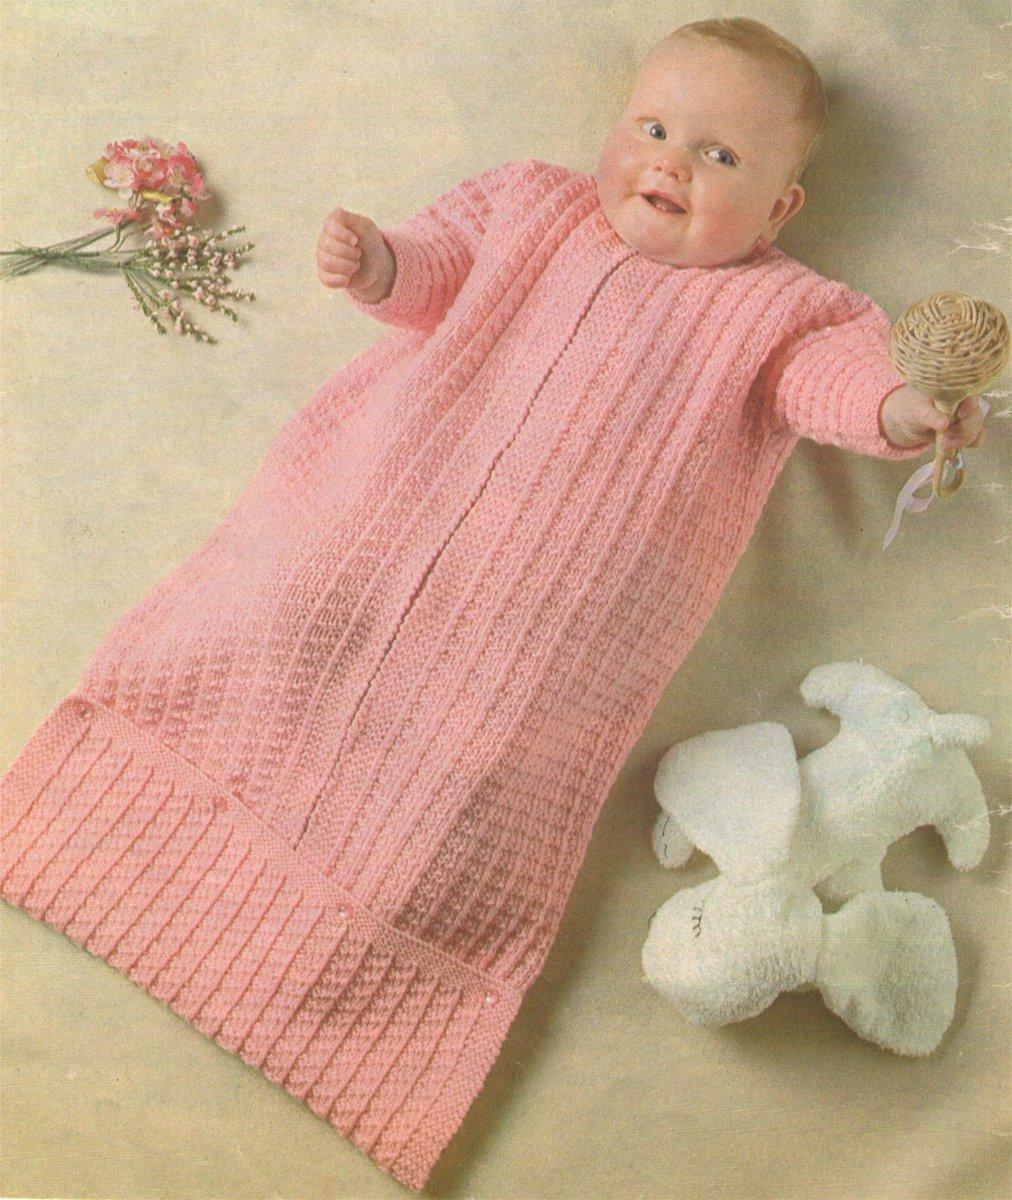 b209535cb PDF Knitting and Crochet Patterns on Twitter